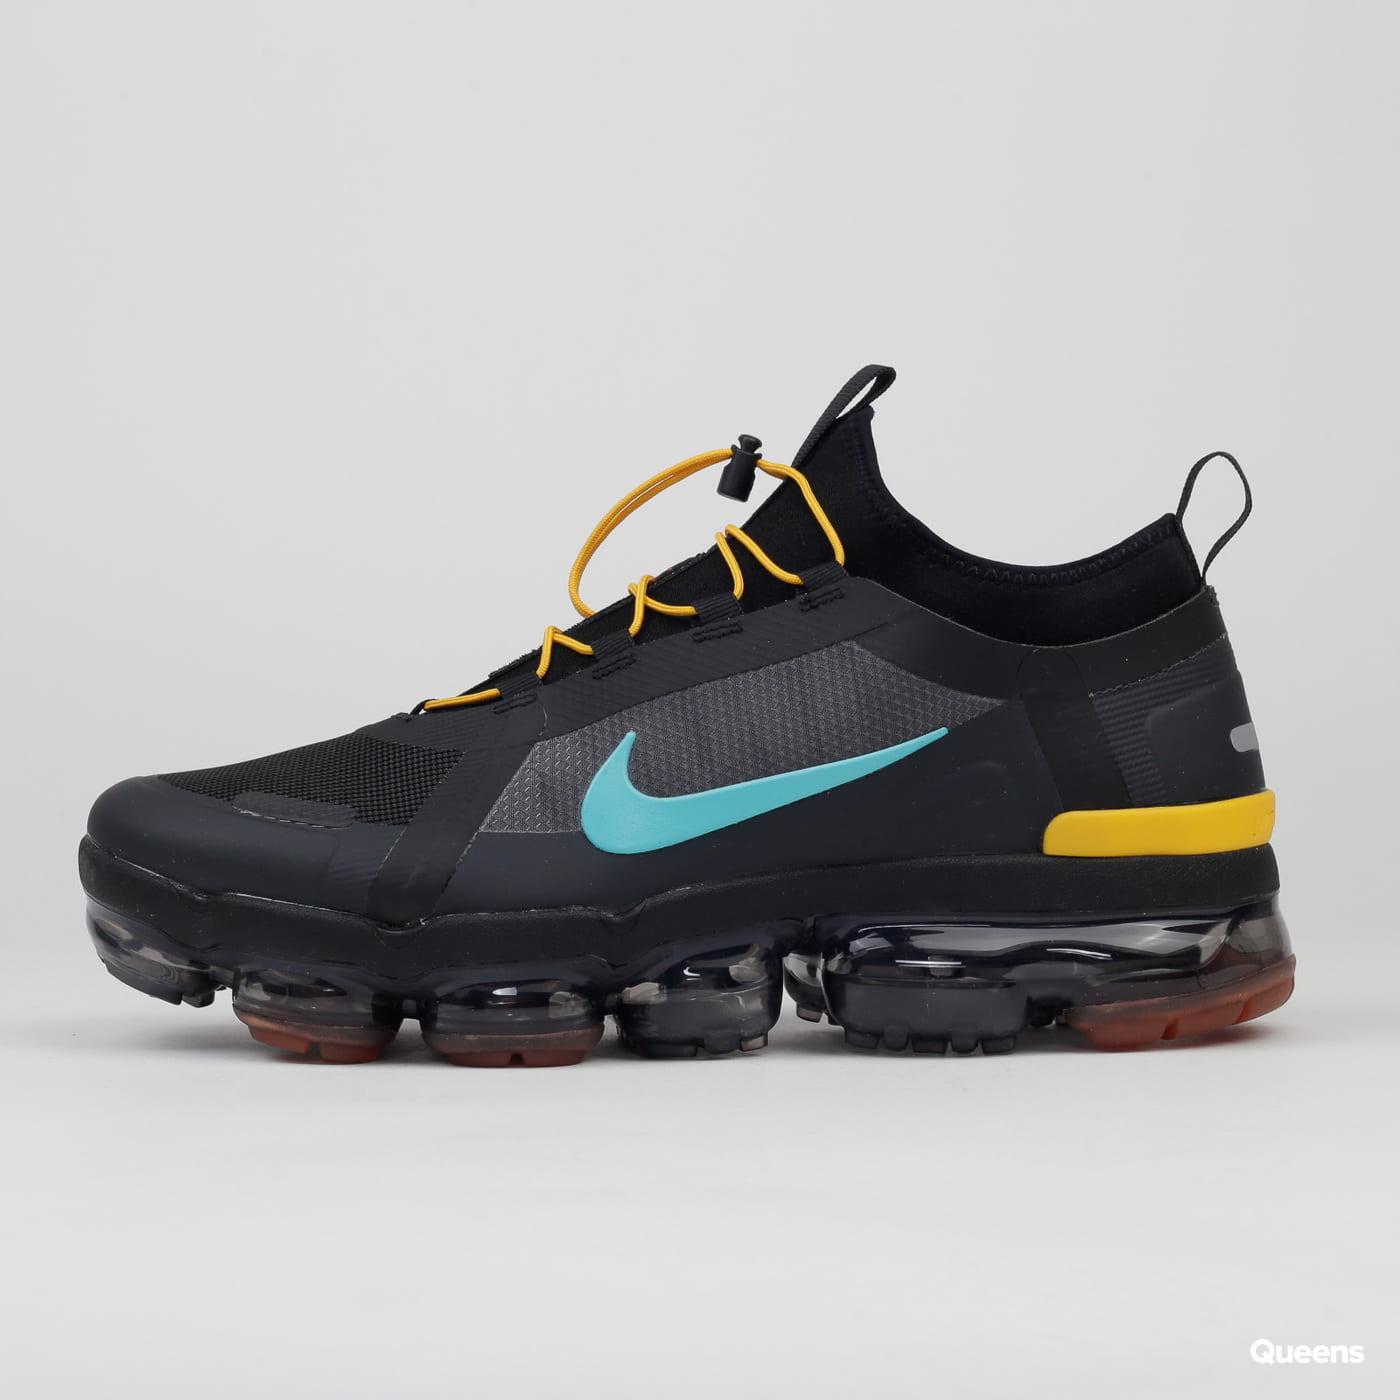 Nike Air Vapormax 2019 Utility off noir teal nebula black